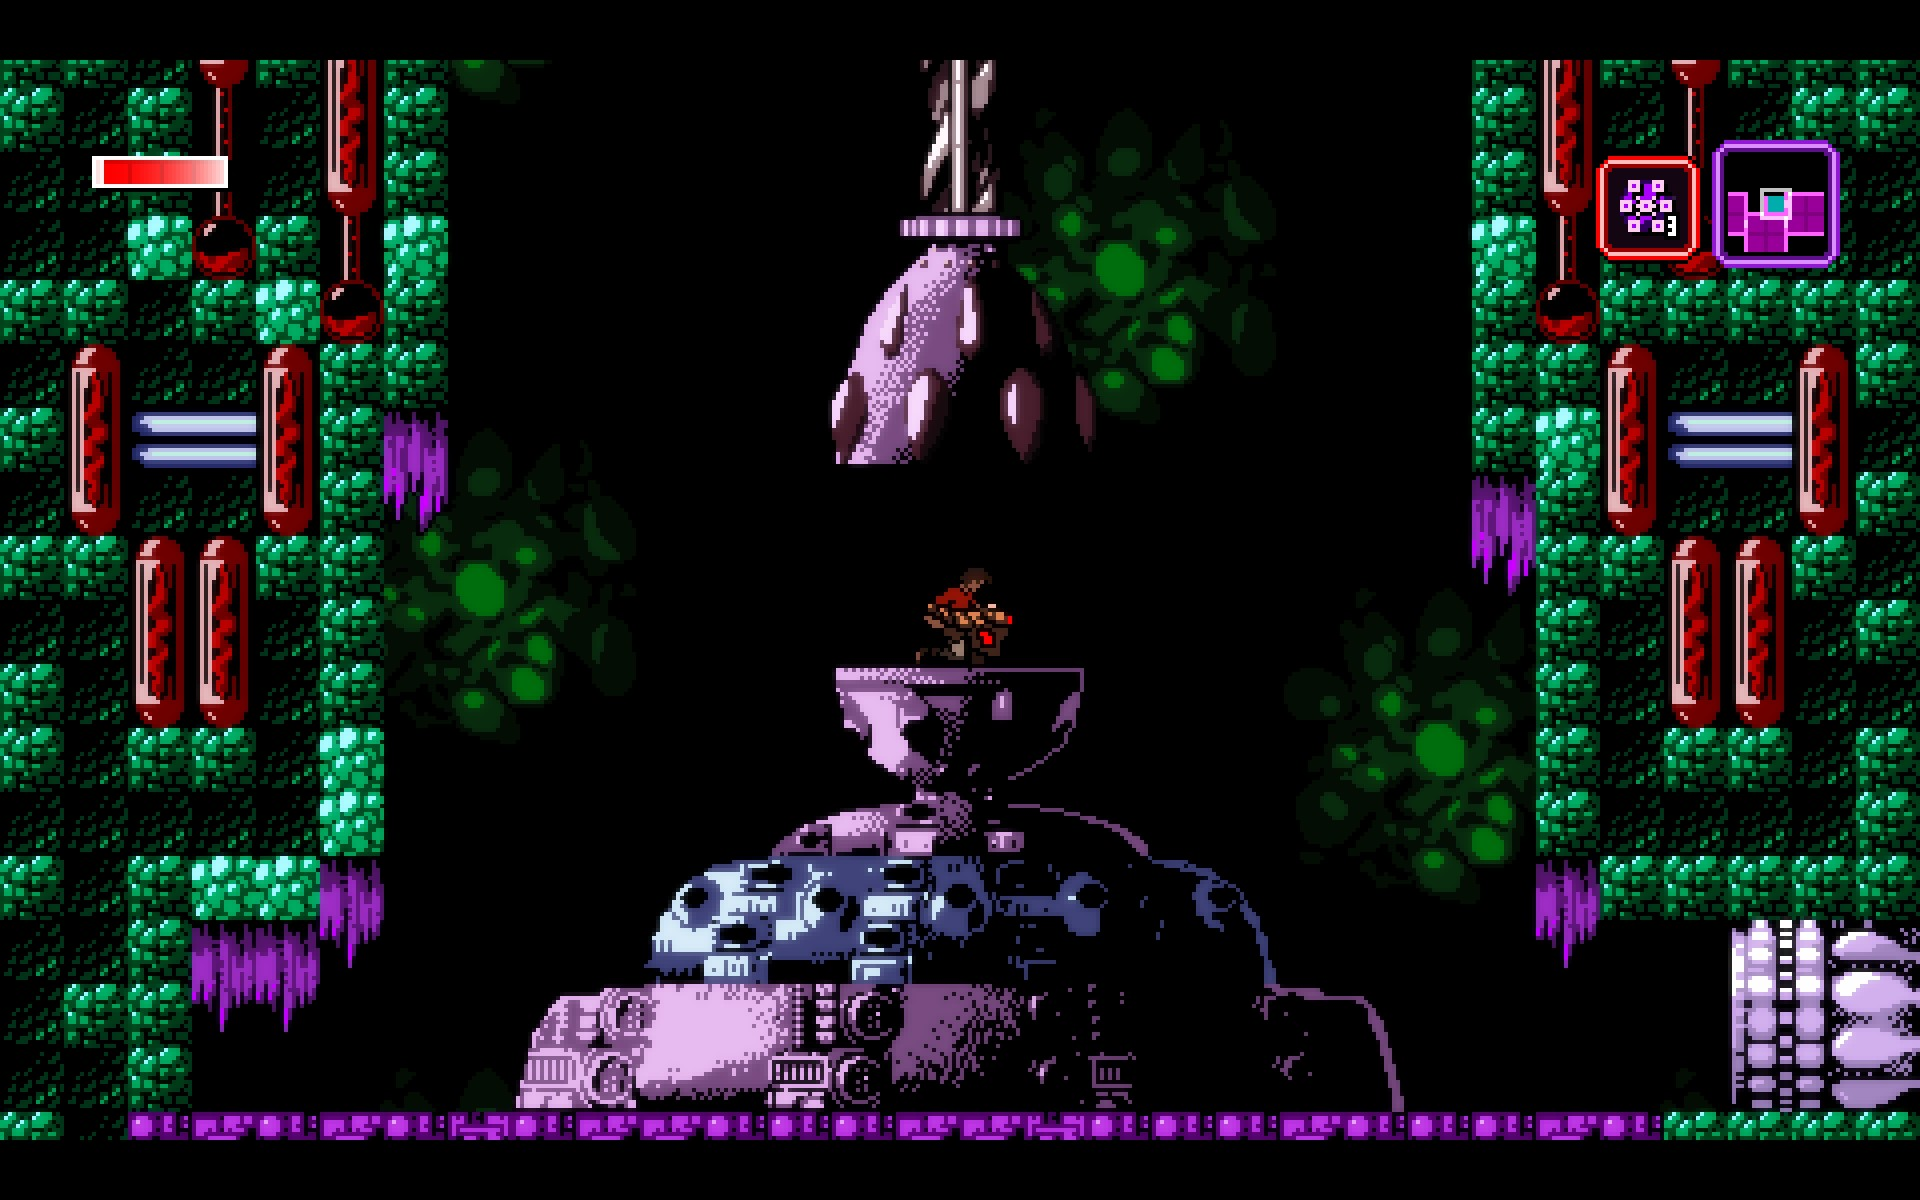 Axiom Verge from Thomas Happ Games